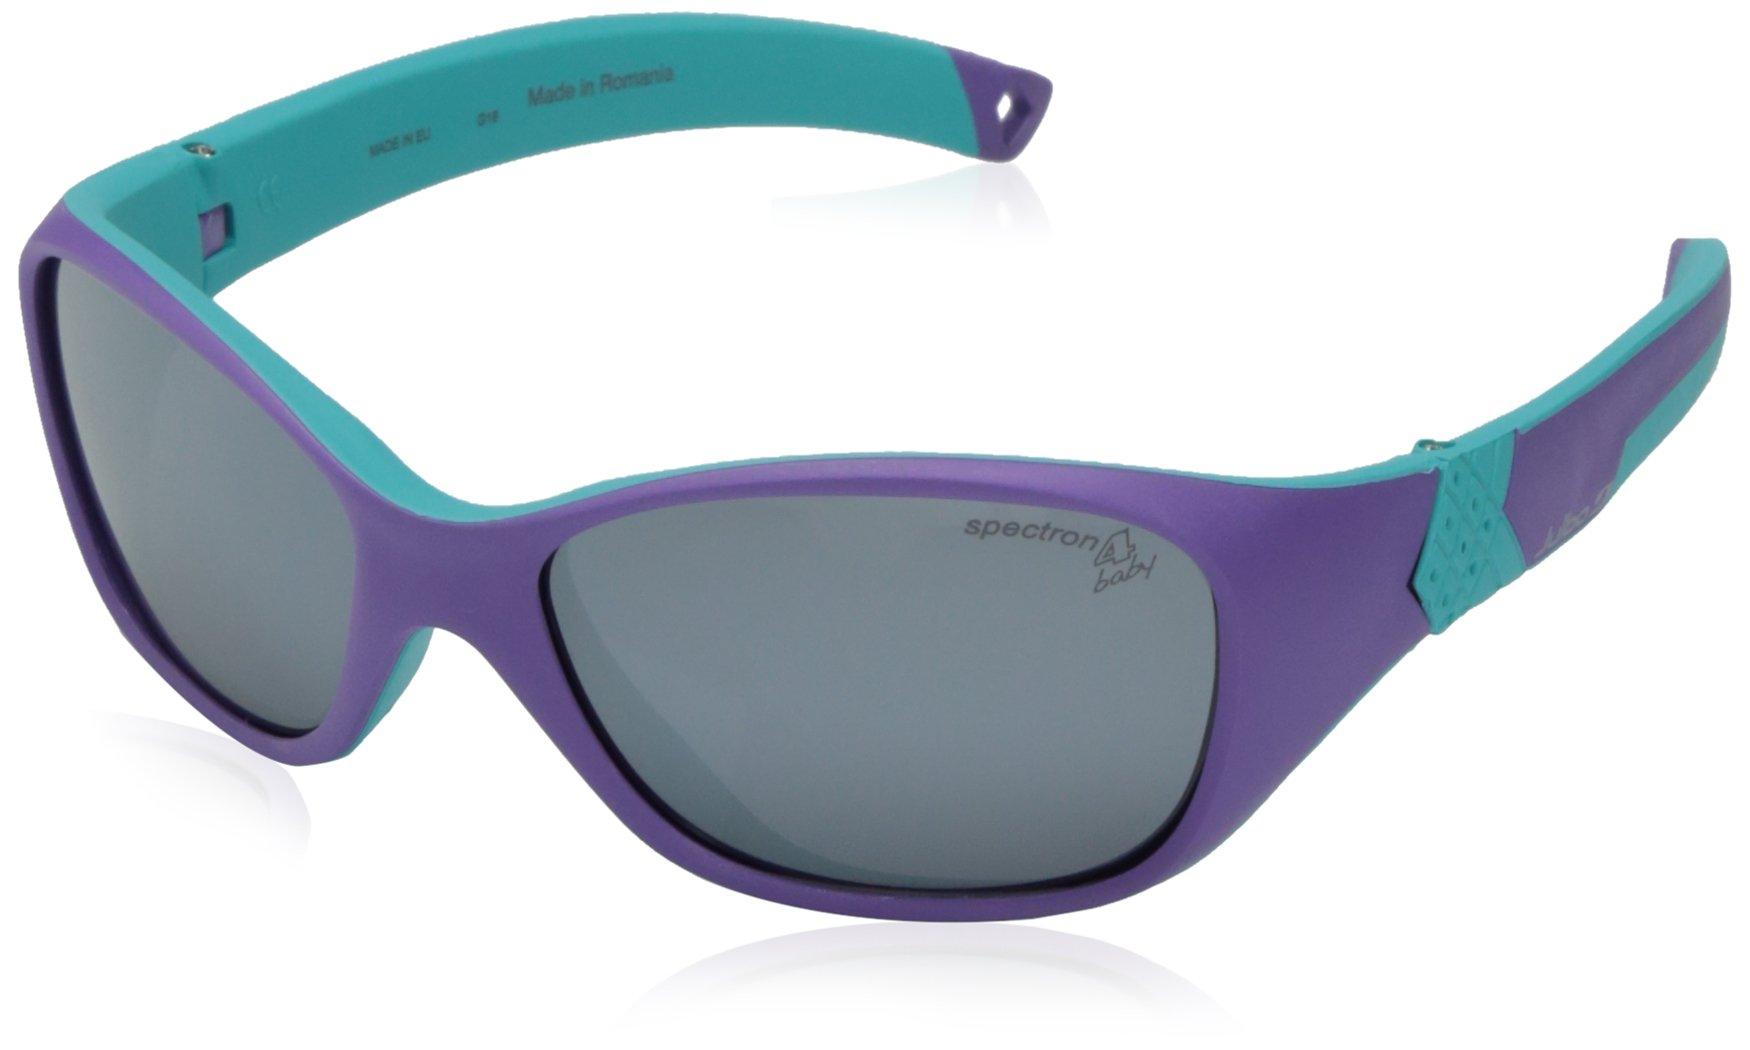 Julbo Spectron 4 Baby Lenses Solan Sunglasses, Purple/Tourquise, 4-6 Years